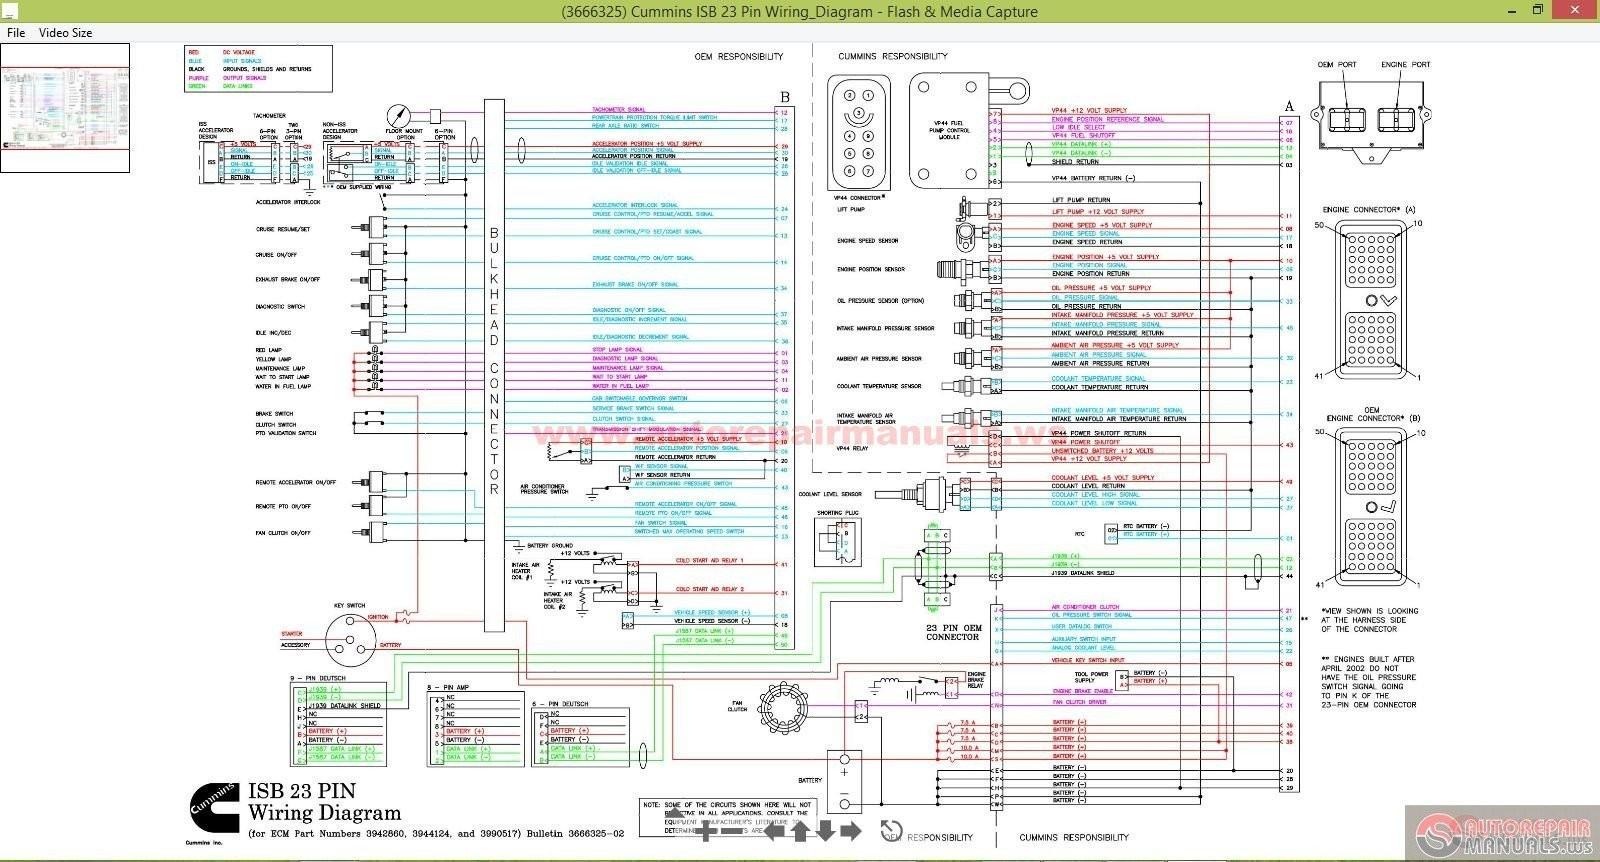 Cat Mxs Ecm Wiring Diagram | Wiring Diagram